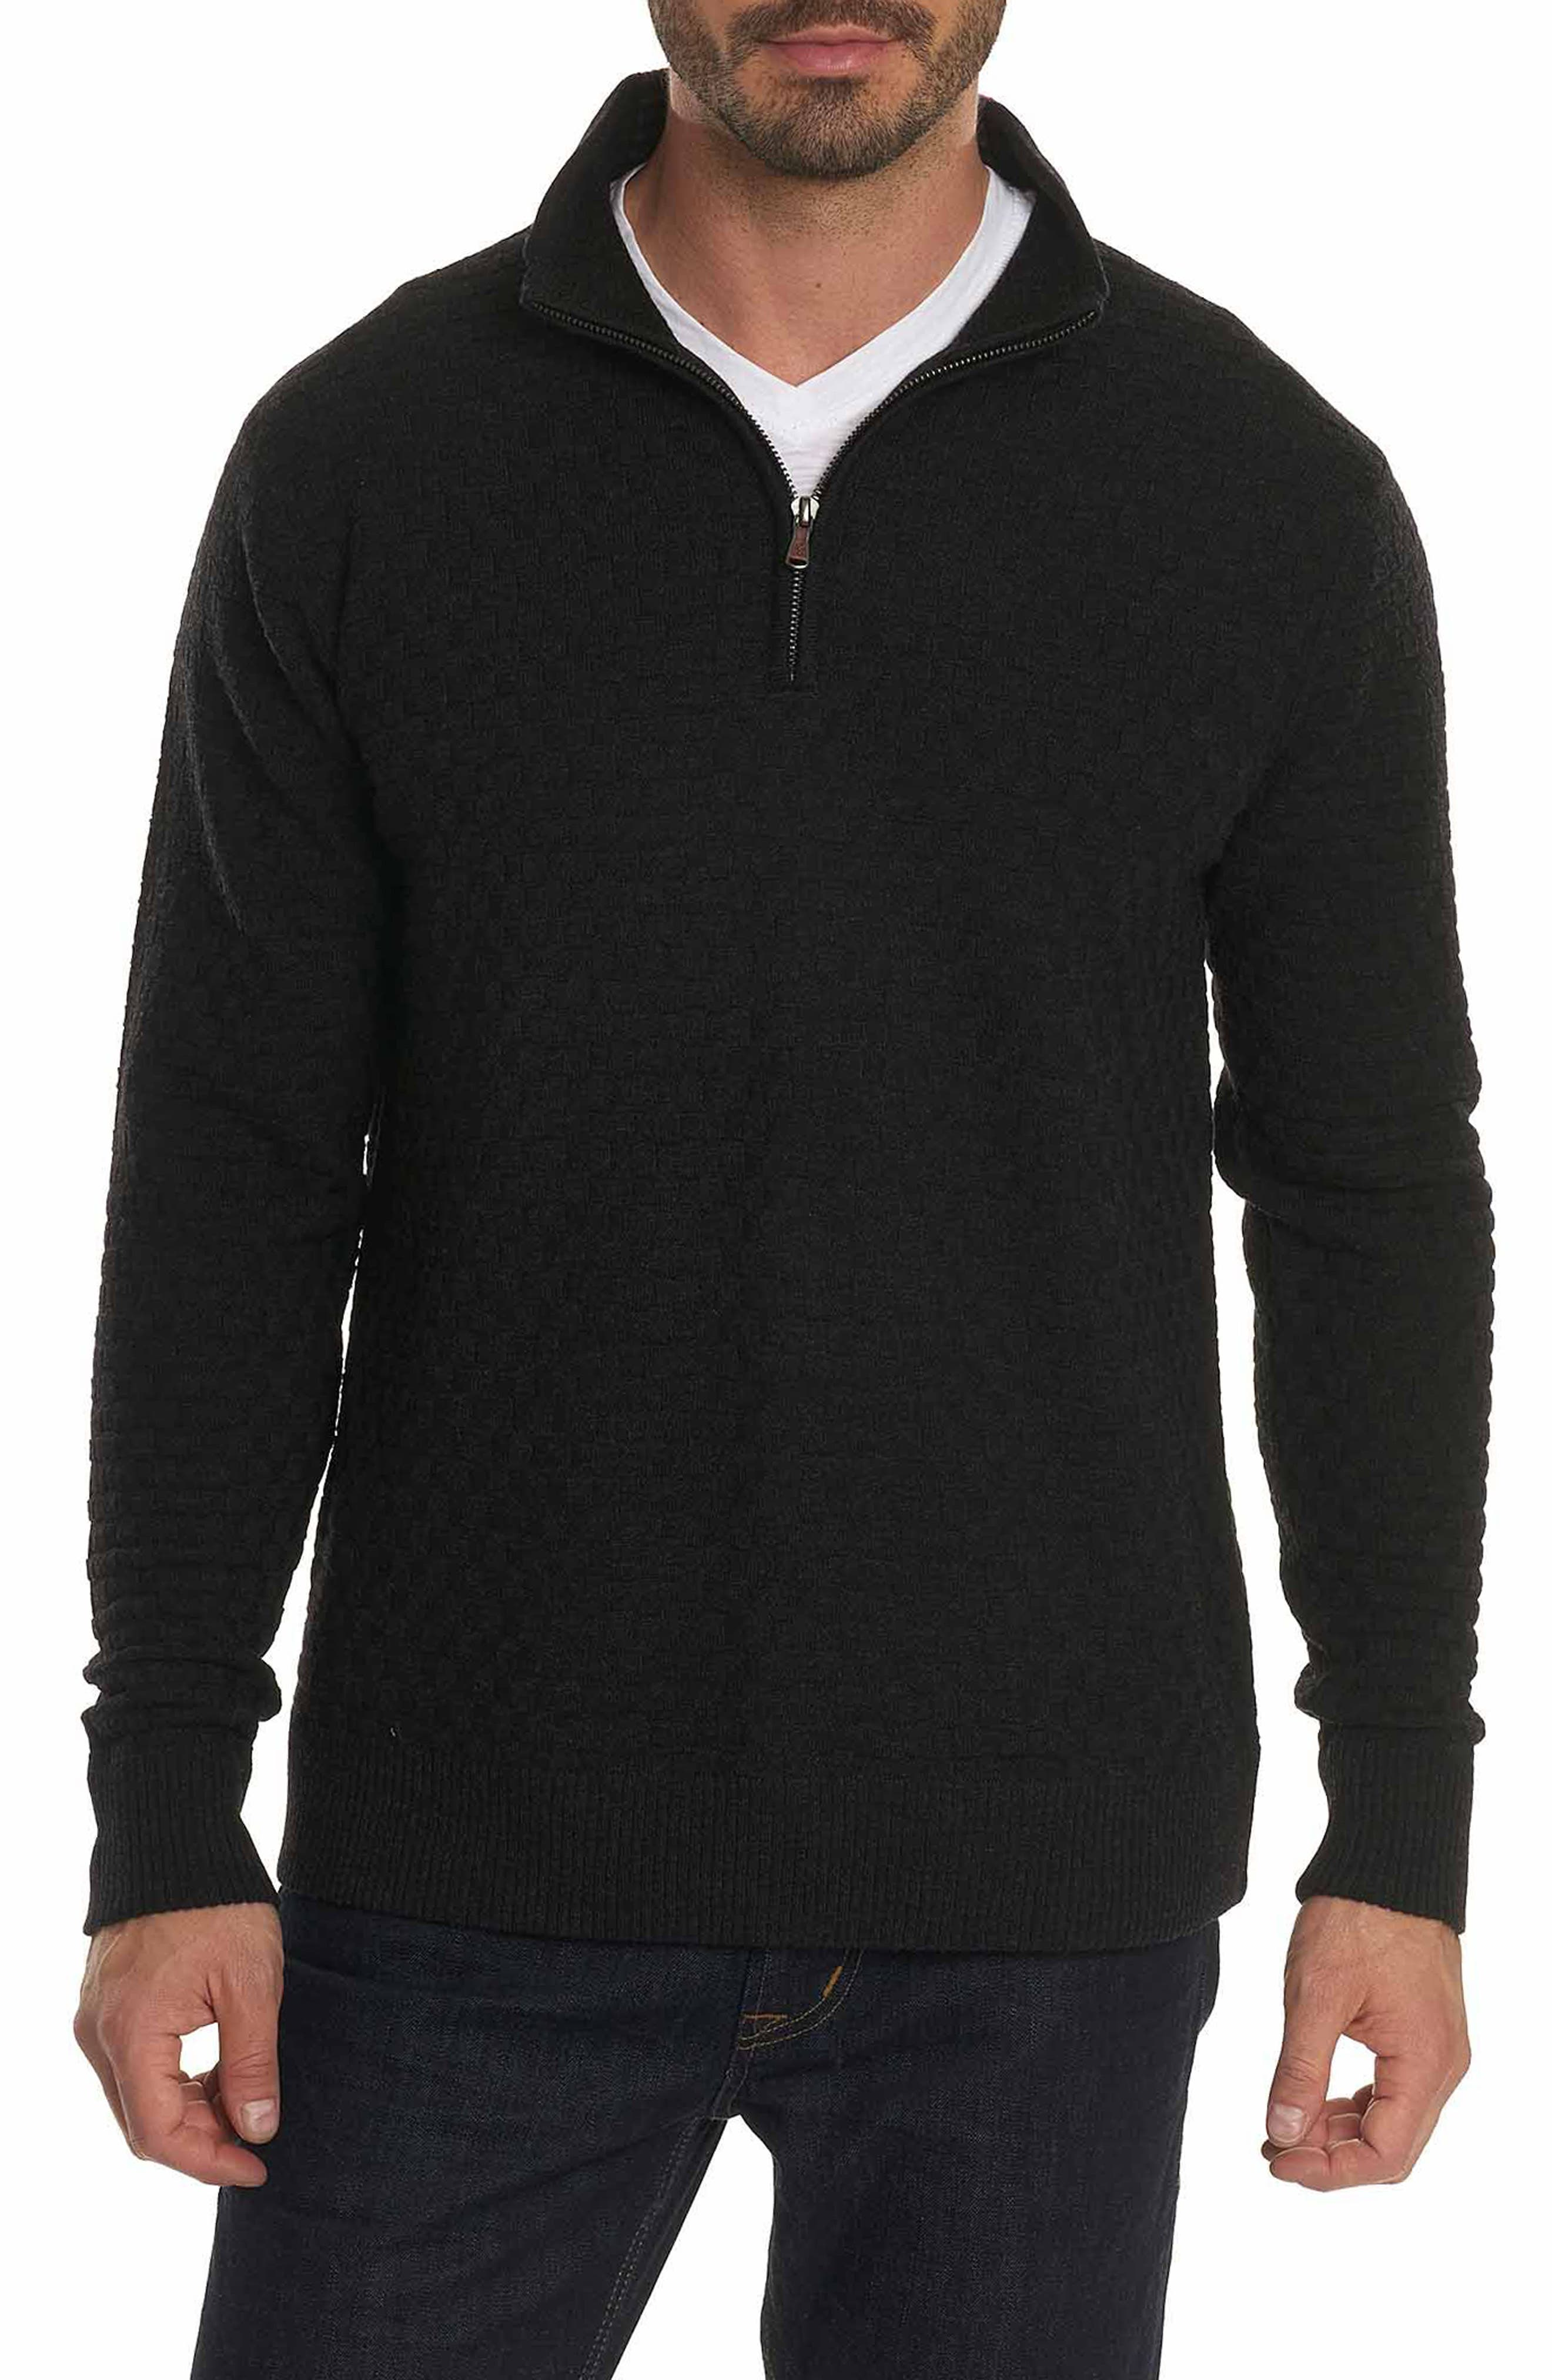 American Beech Wool Sweater,                             Main thumbnail 1, color,                             001